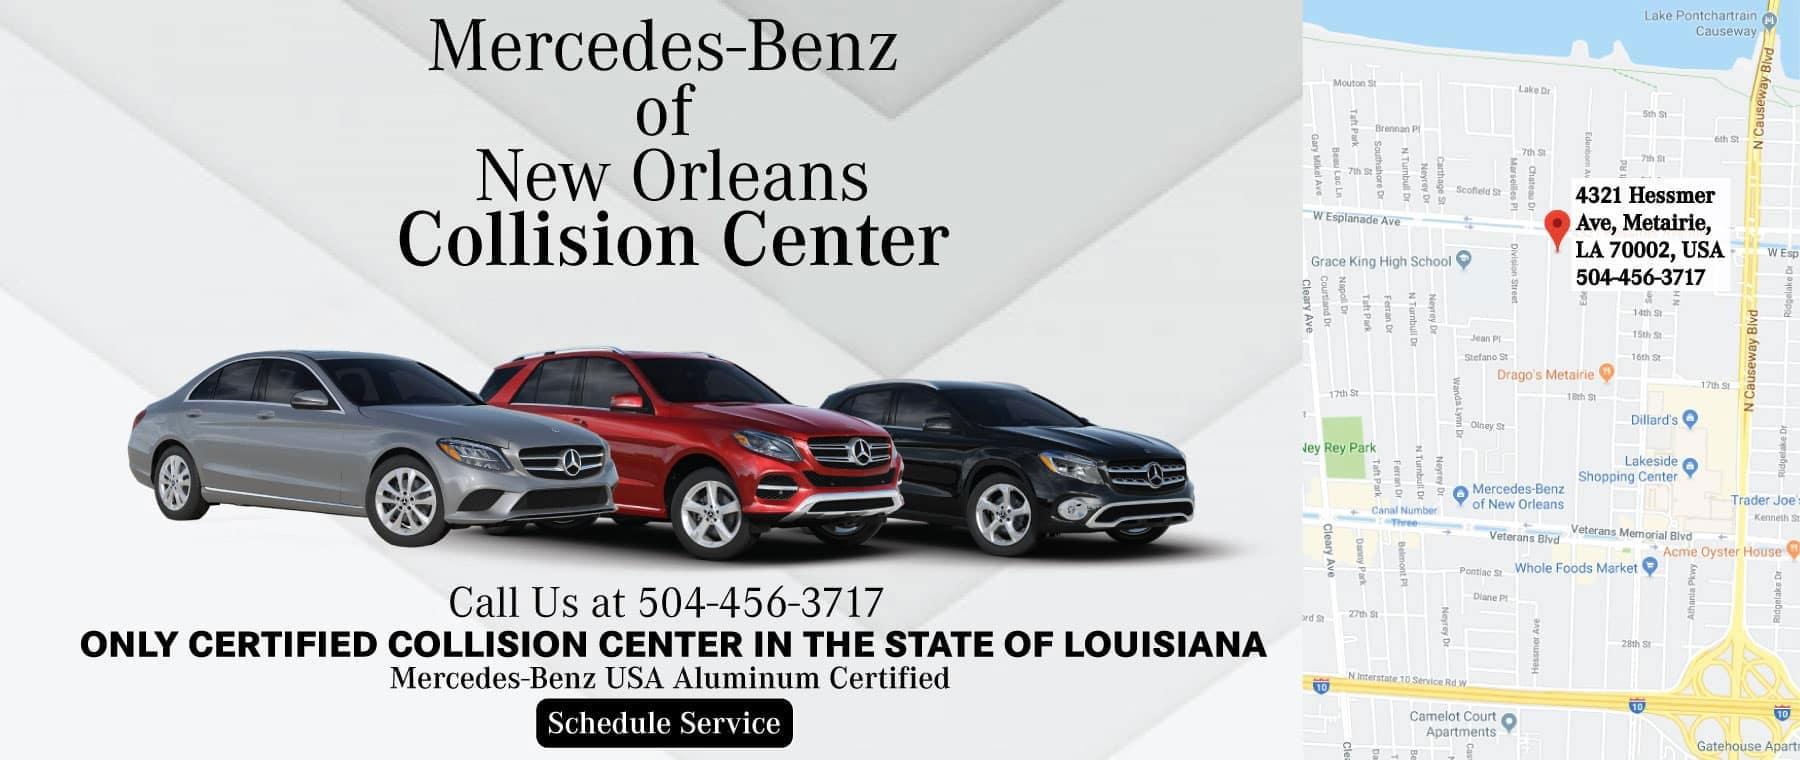 Mercedes-Benz Collision Center in New Orleans